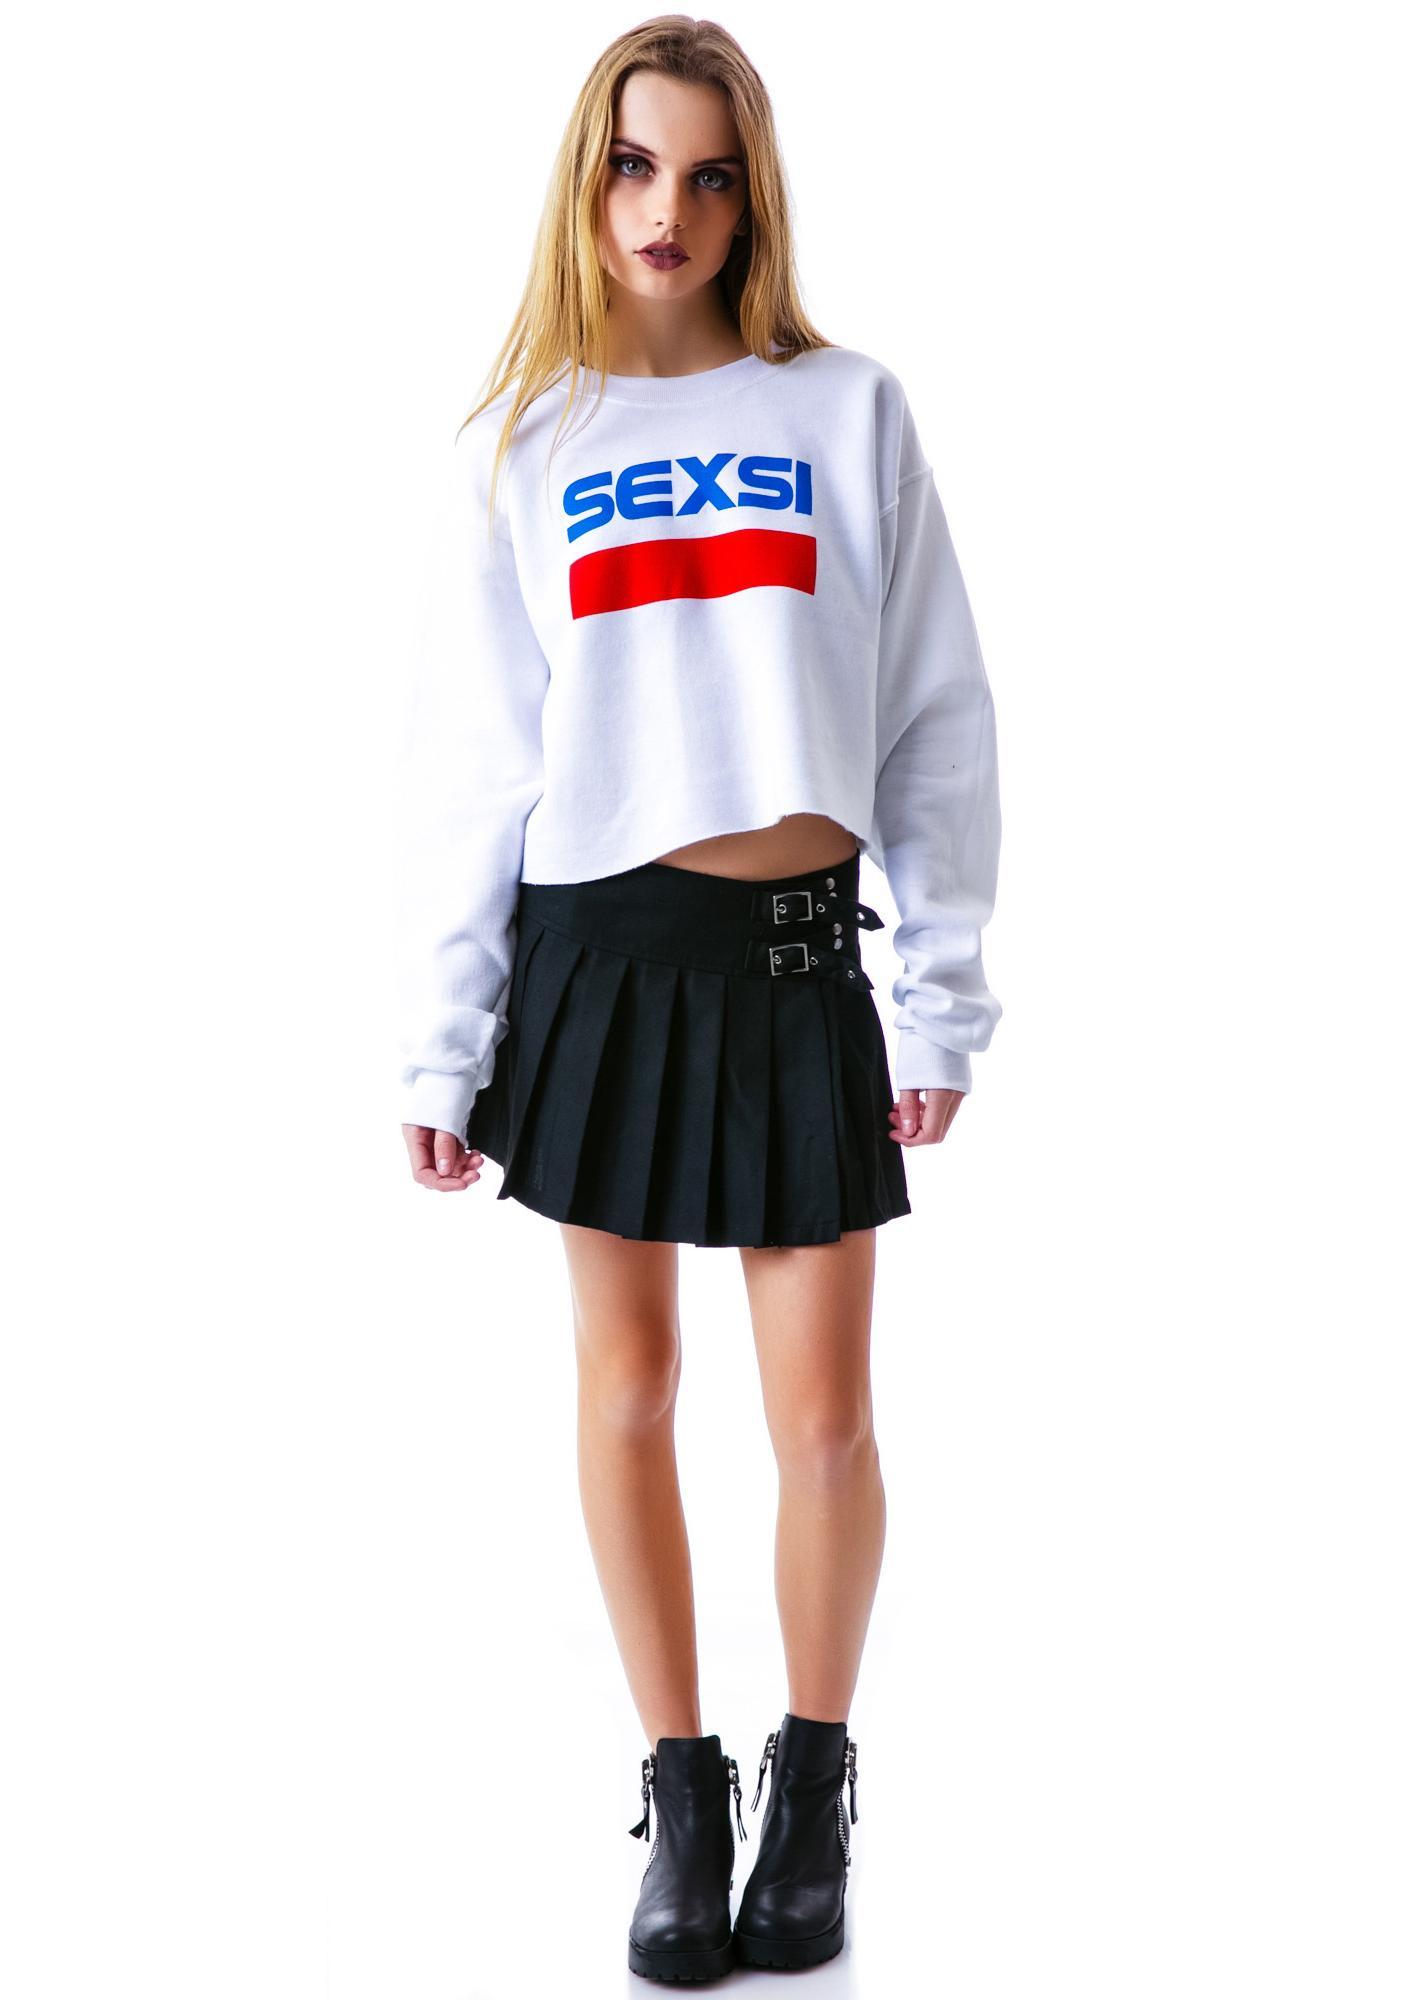 Petals and Peacocks Sexsi Crop Sweatshirt